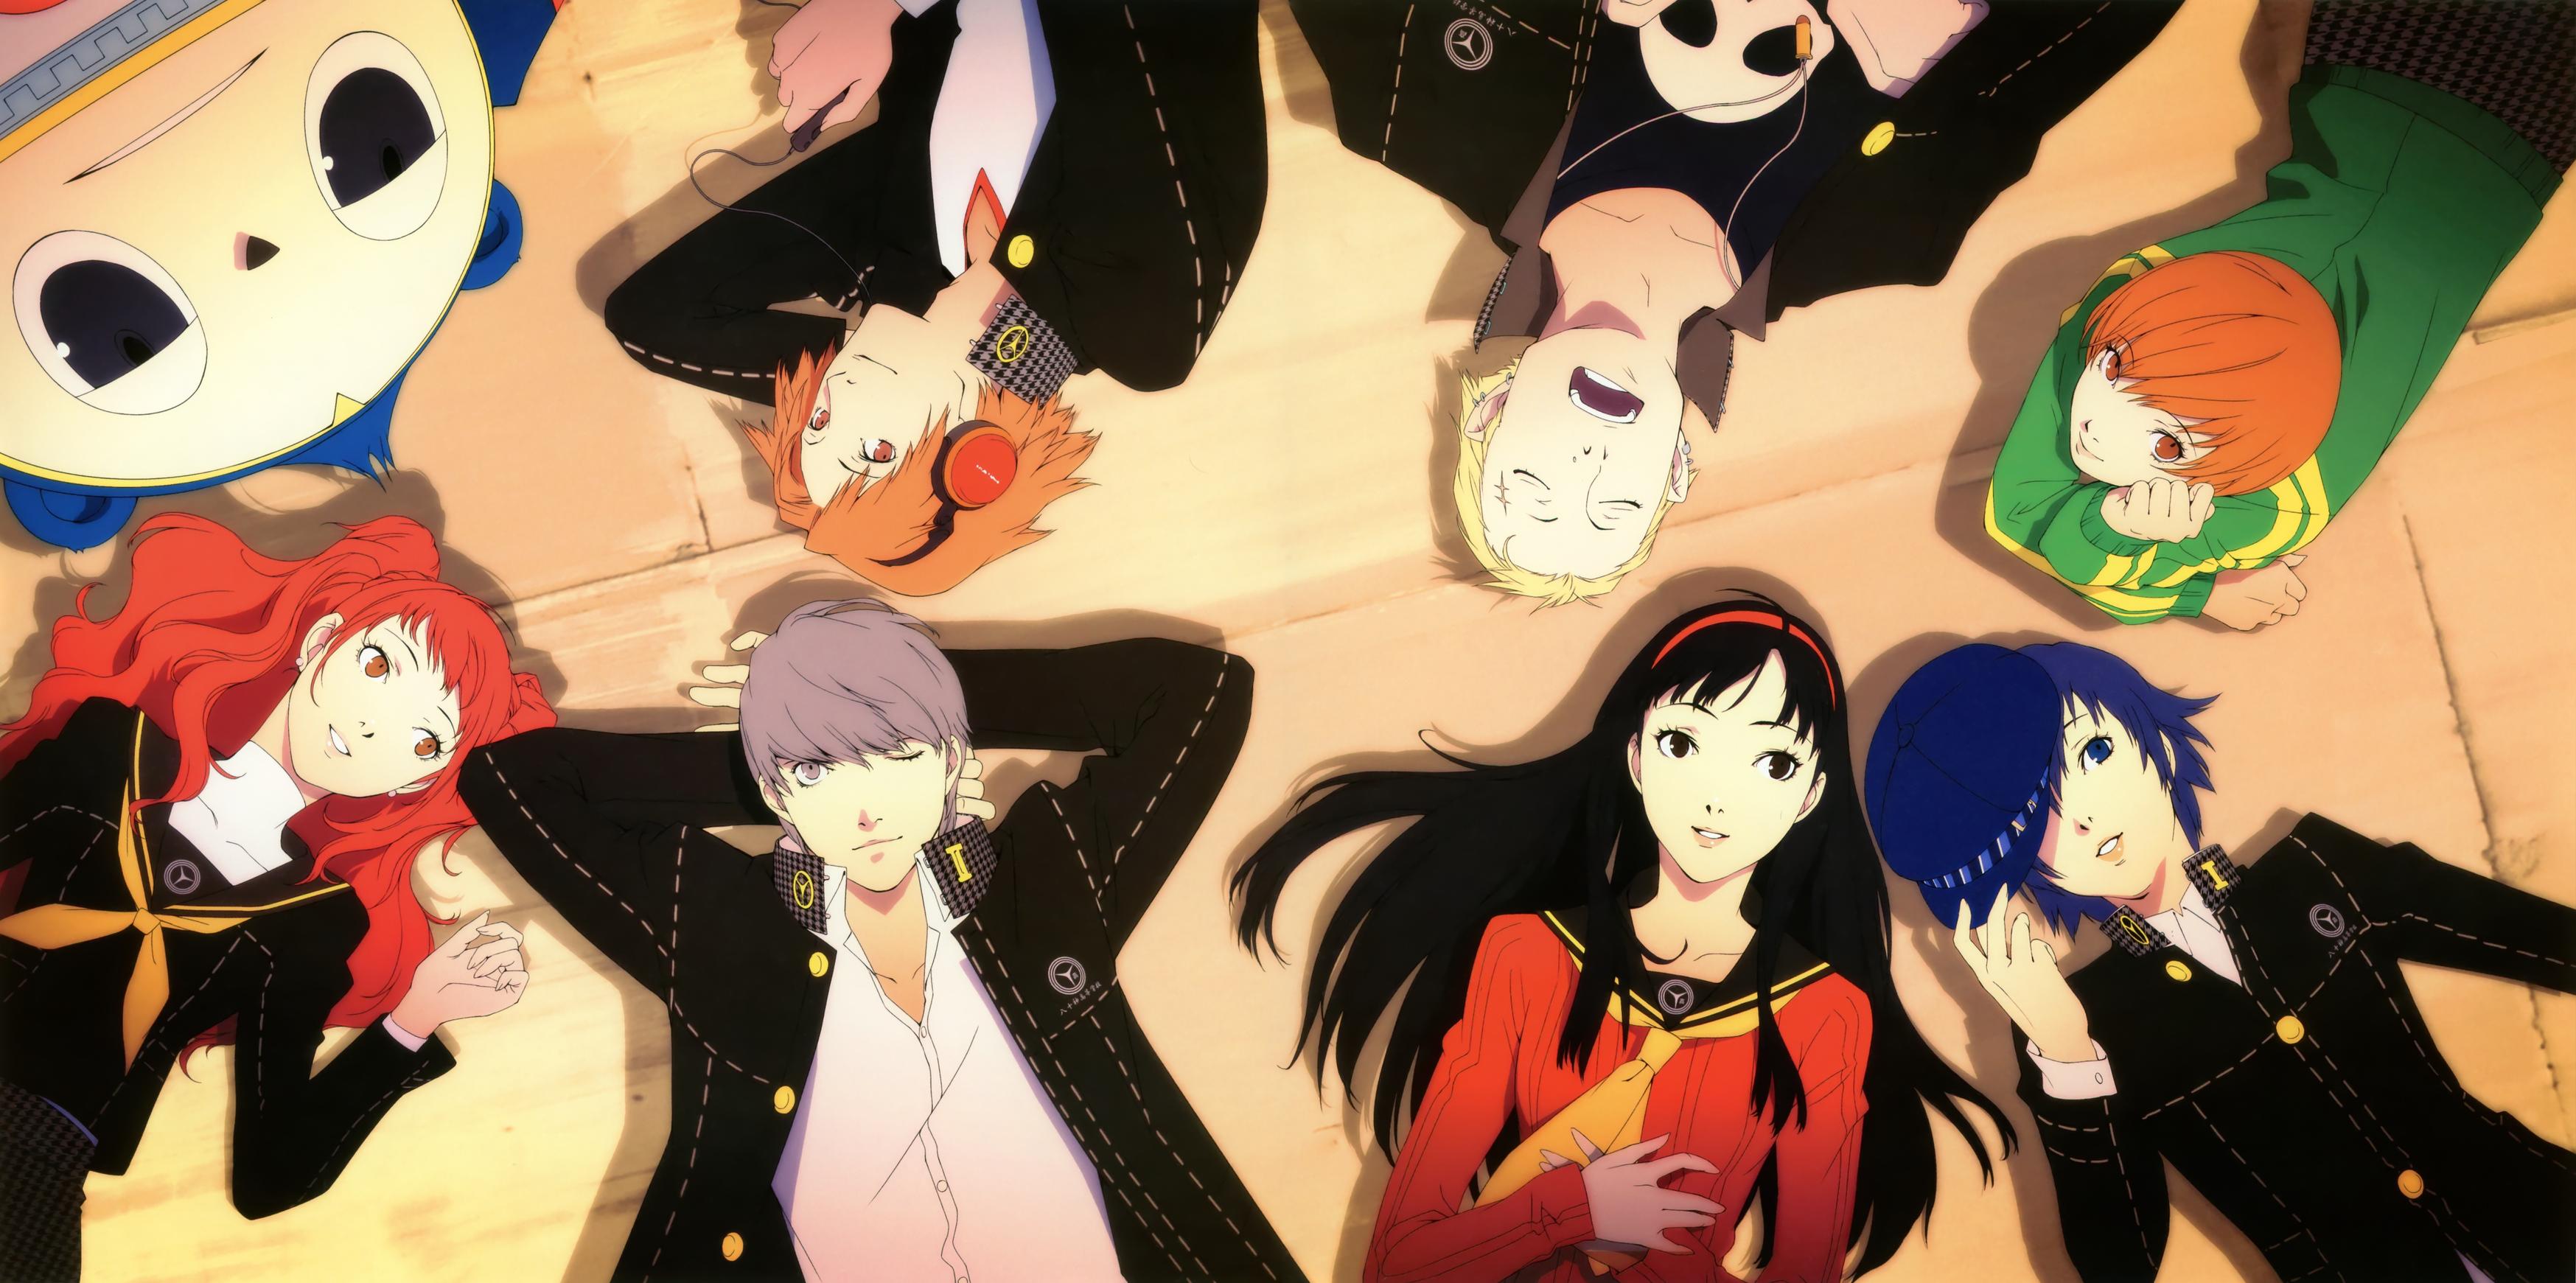 Persona 4 cast.jpg